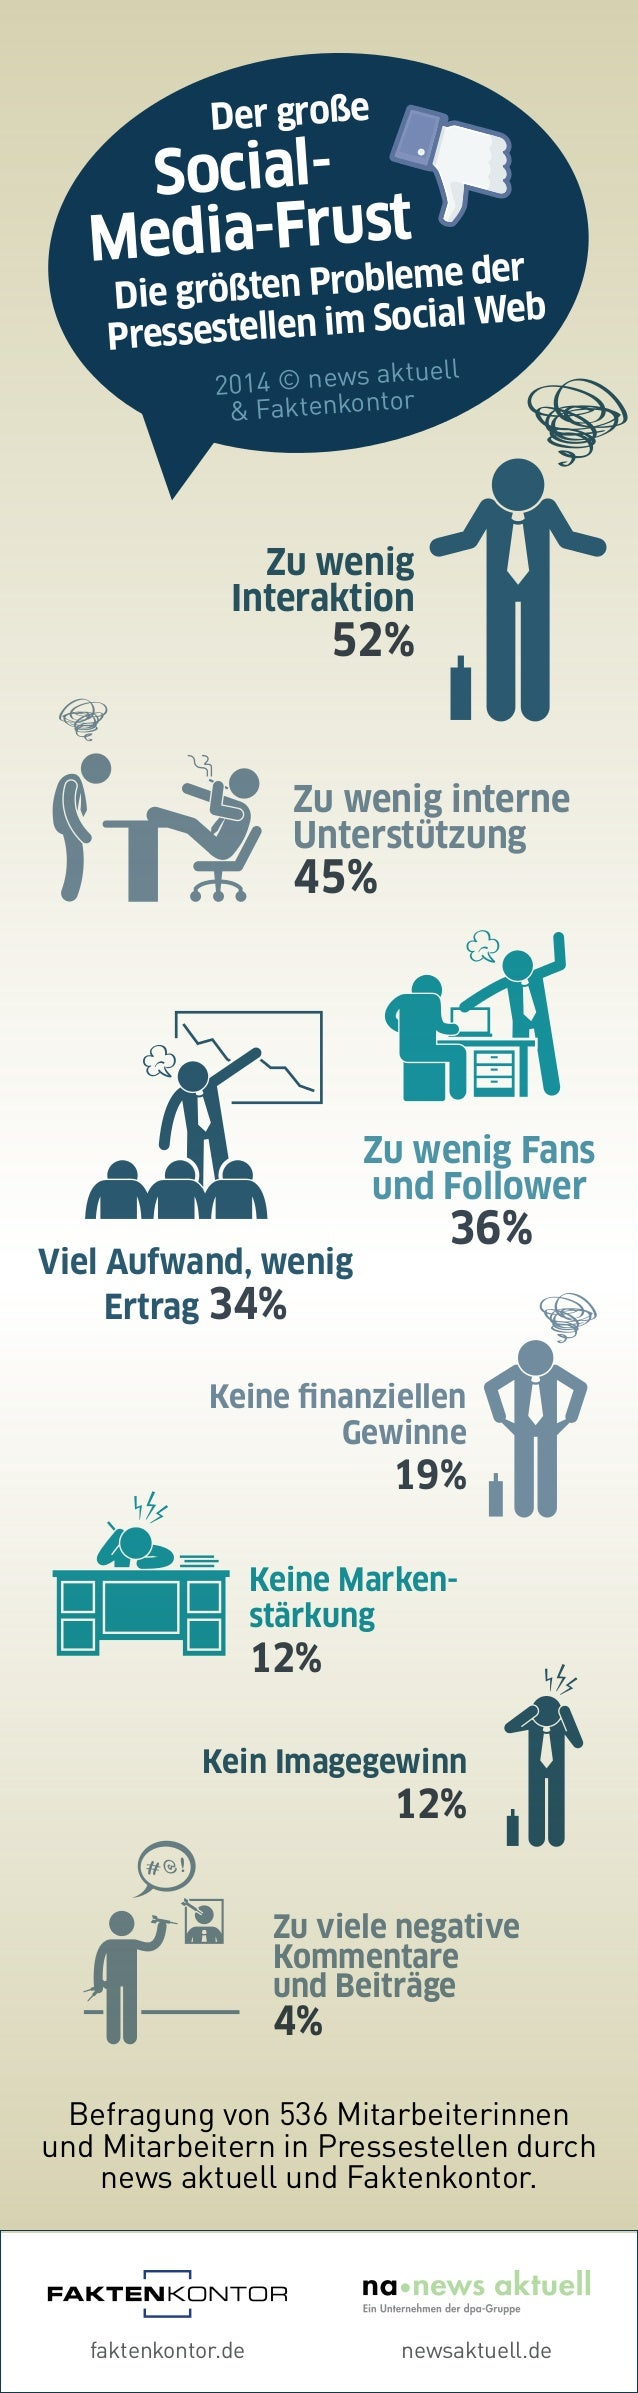 Der große  Social-  Media-Frust  Die größten Probleme der  Pressestellen im Social Web  2014 © news aktuell  & Faktenkonto...